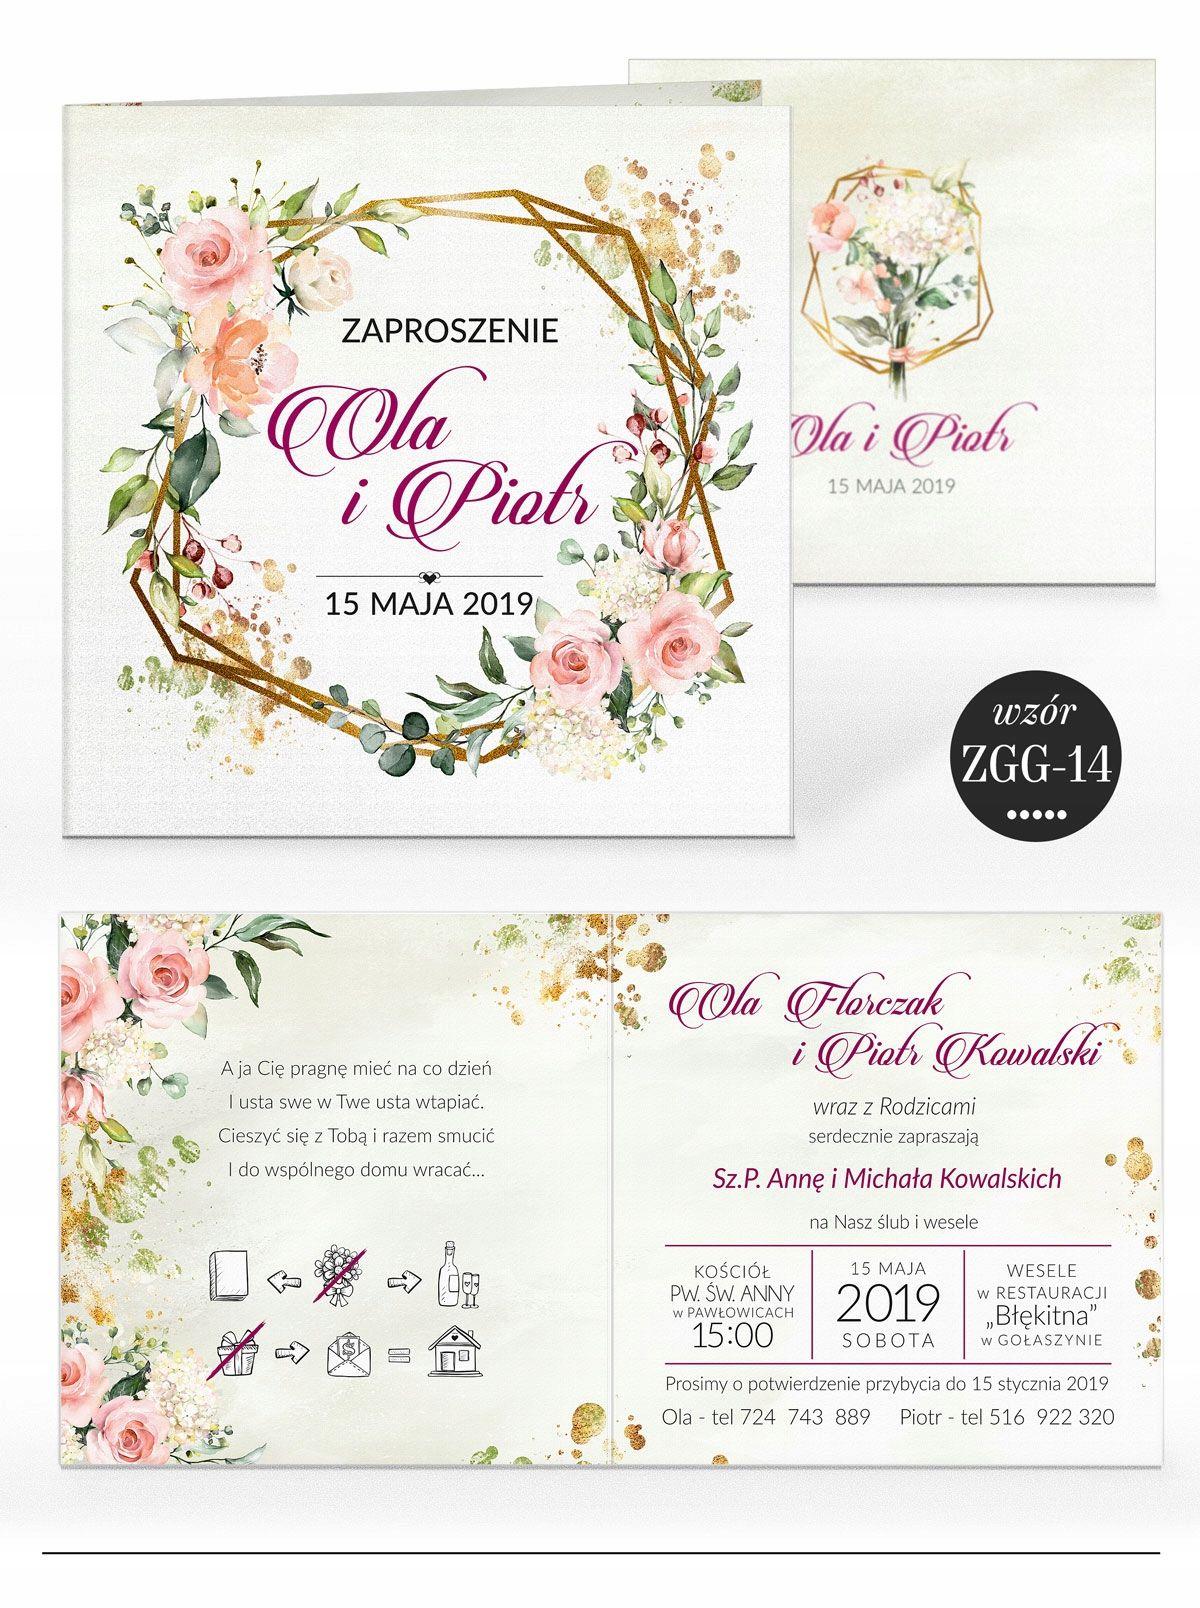 Zaproszenia Slubne Rustykalne Kwiaty Koperta Wedding Wedding Decorations Wedding Inspiration